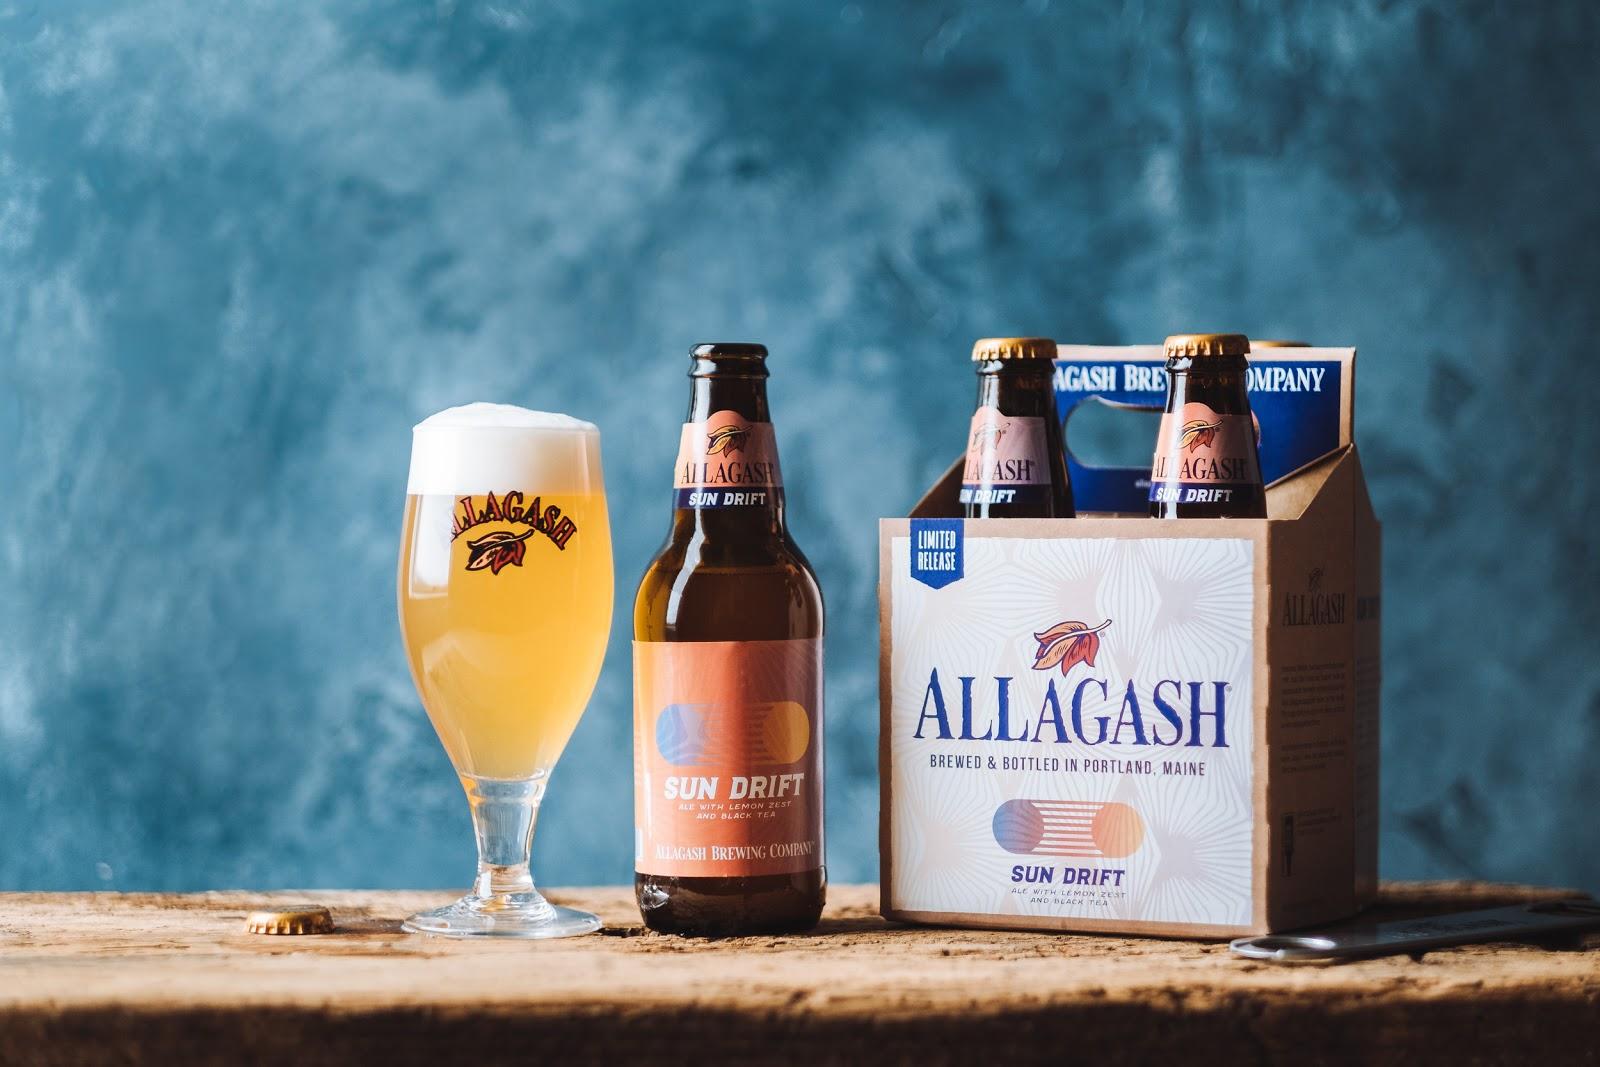 Allagash Brewing Co. Releases Sun Drift, A Tea Beer